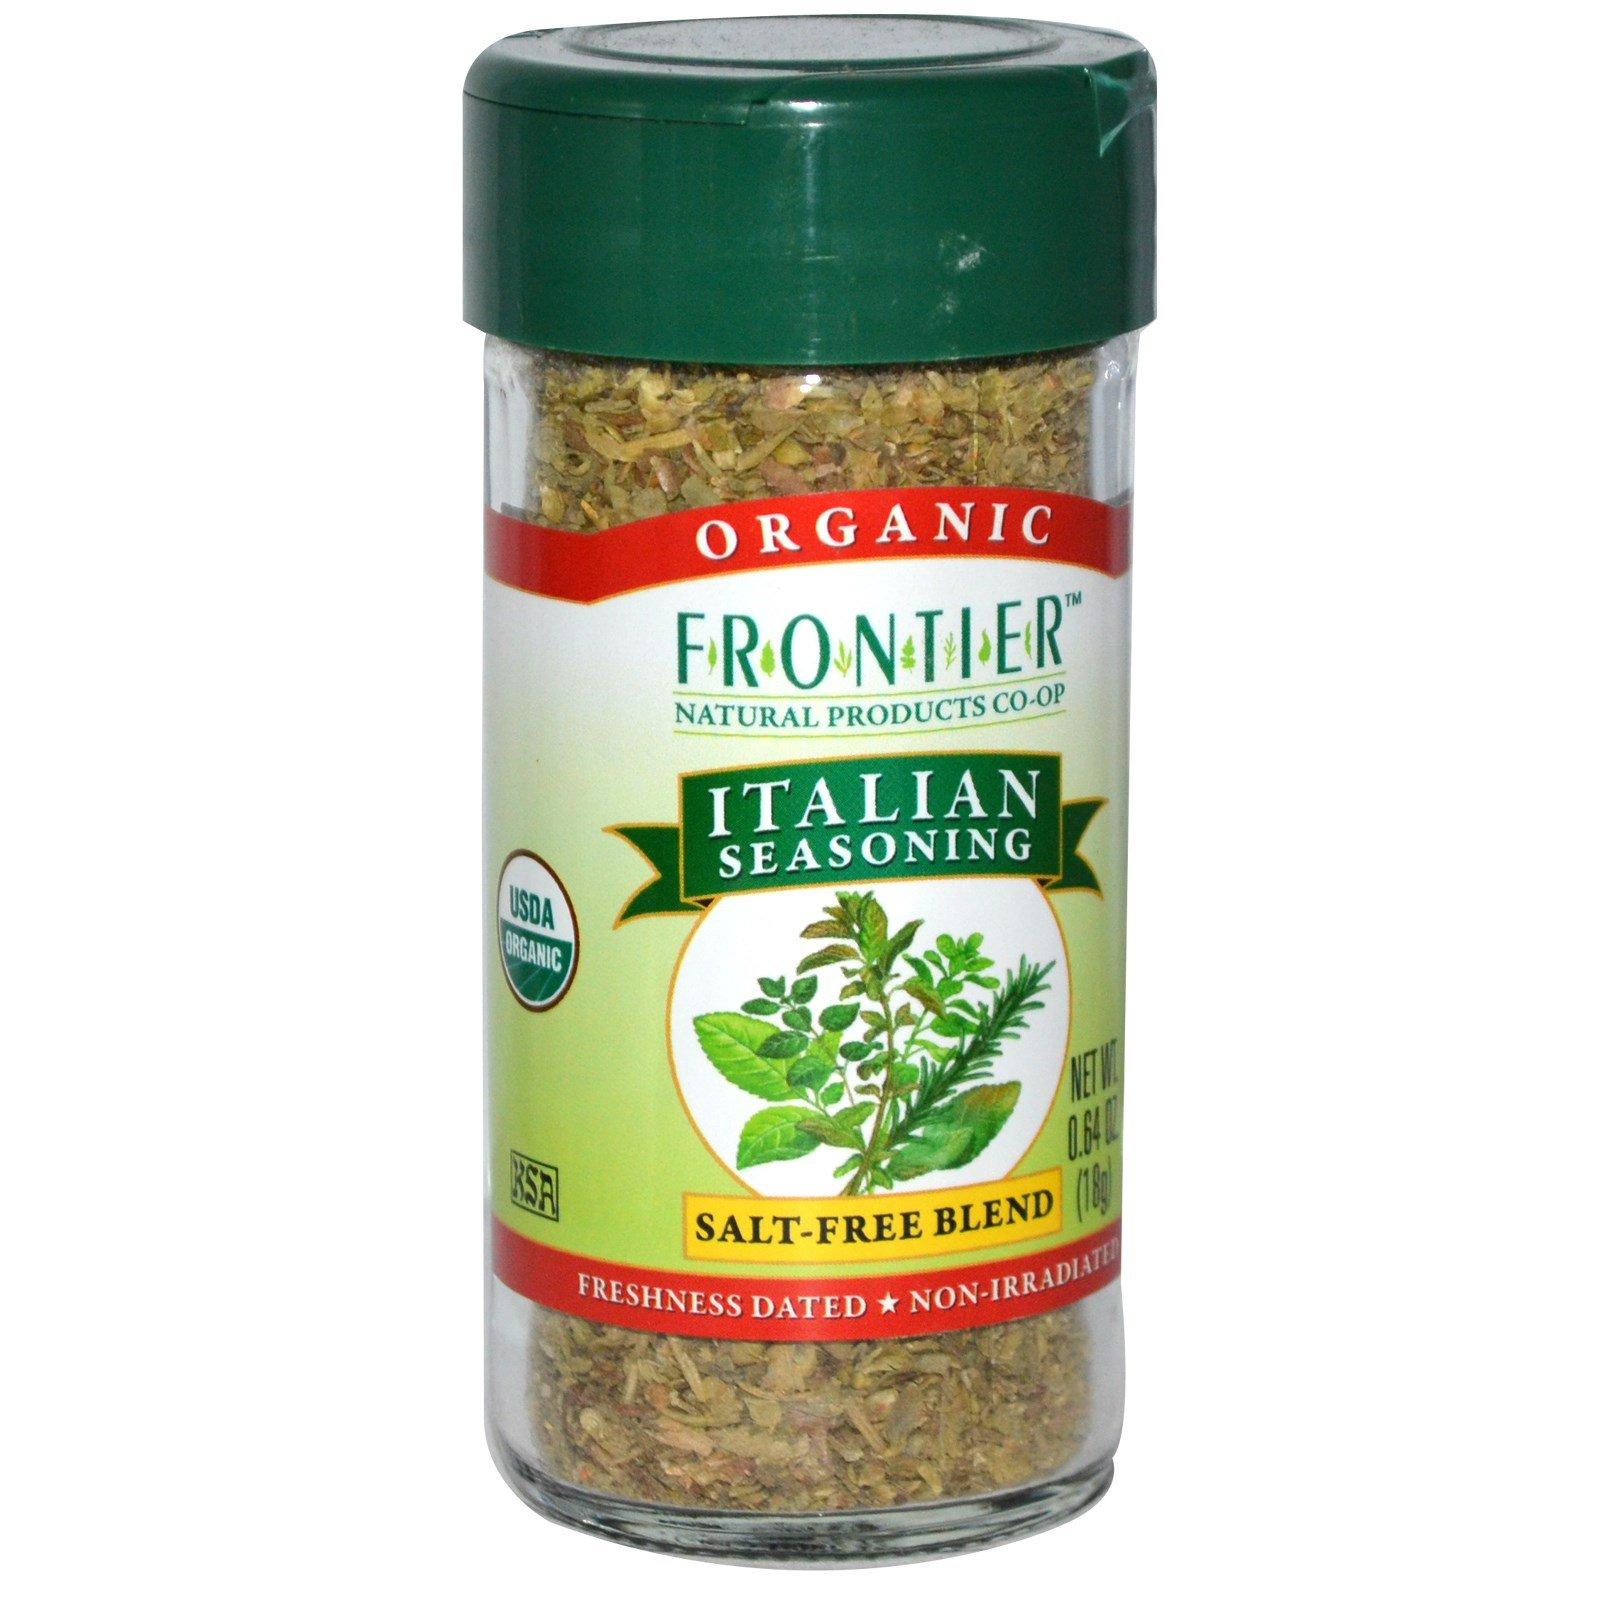 Frontier Natural Products, Organic Italian Seasoning, Salt-Free Blend, 0.64 oz (18 g) - 2pc